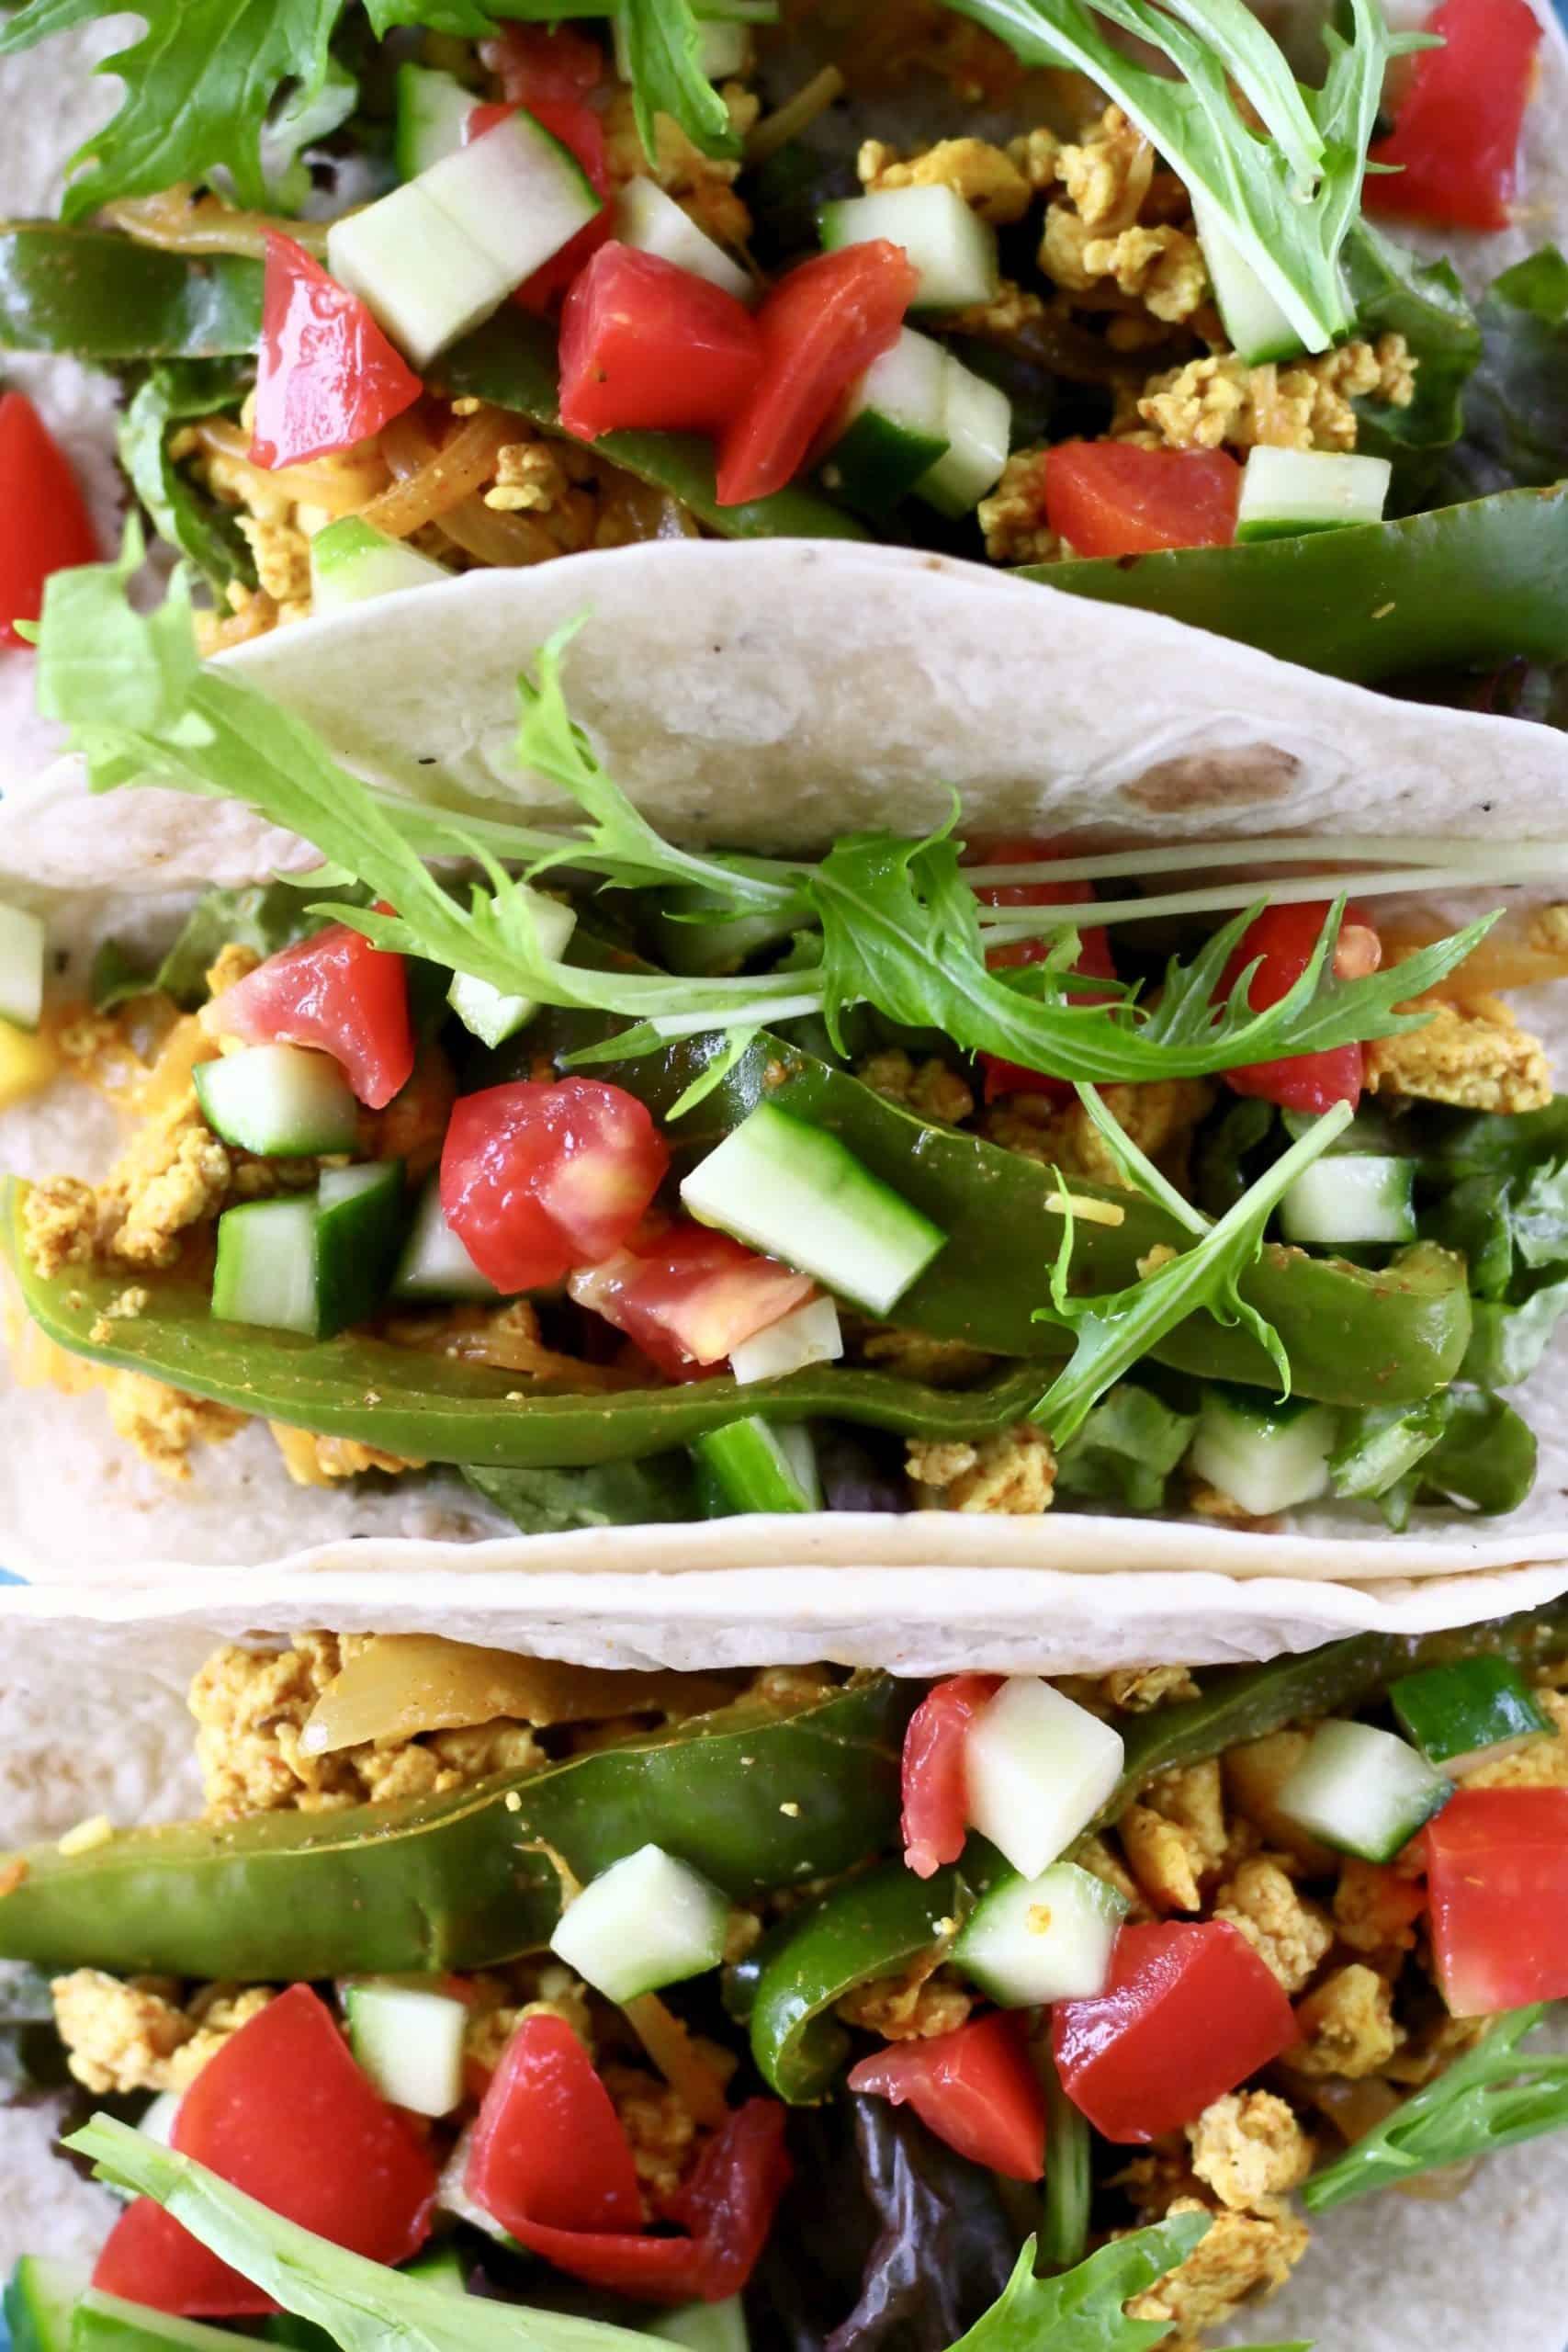 Three scrambled tofu tacos with salad